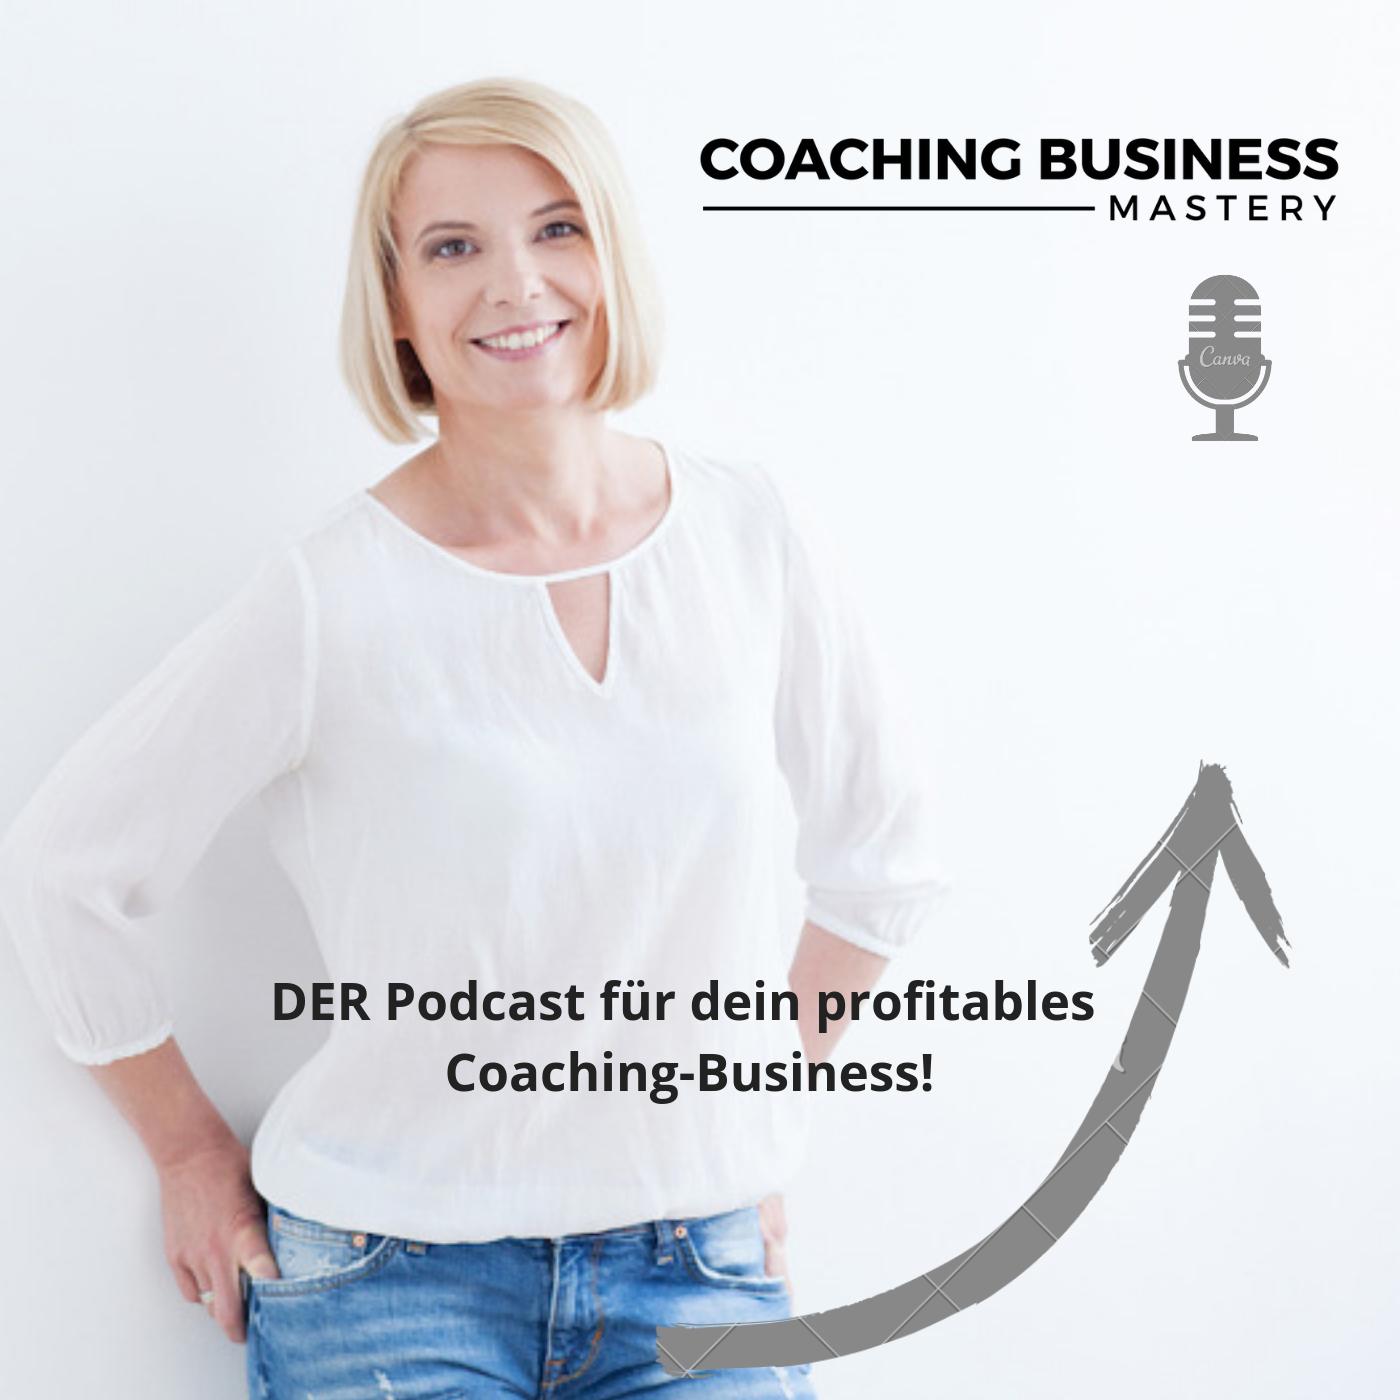 Coaching Business Mastery Podcast mit Sonja Kreye show art